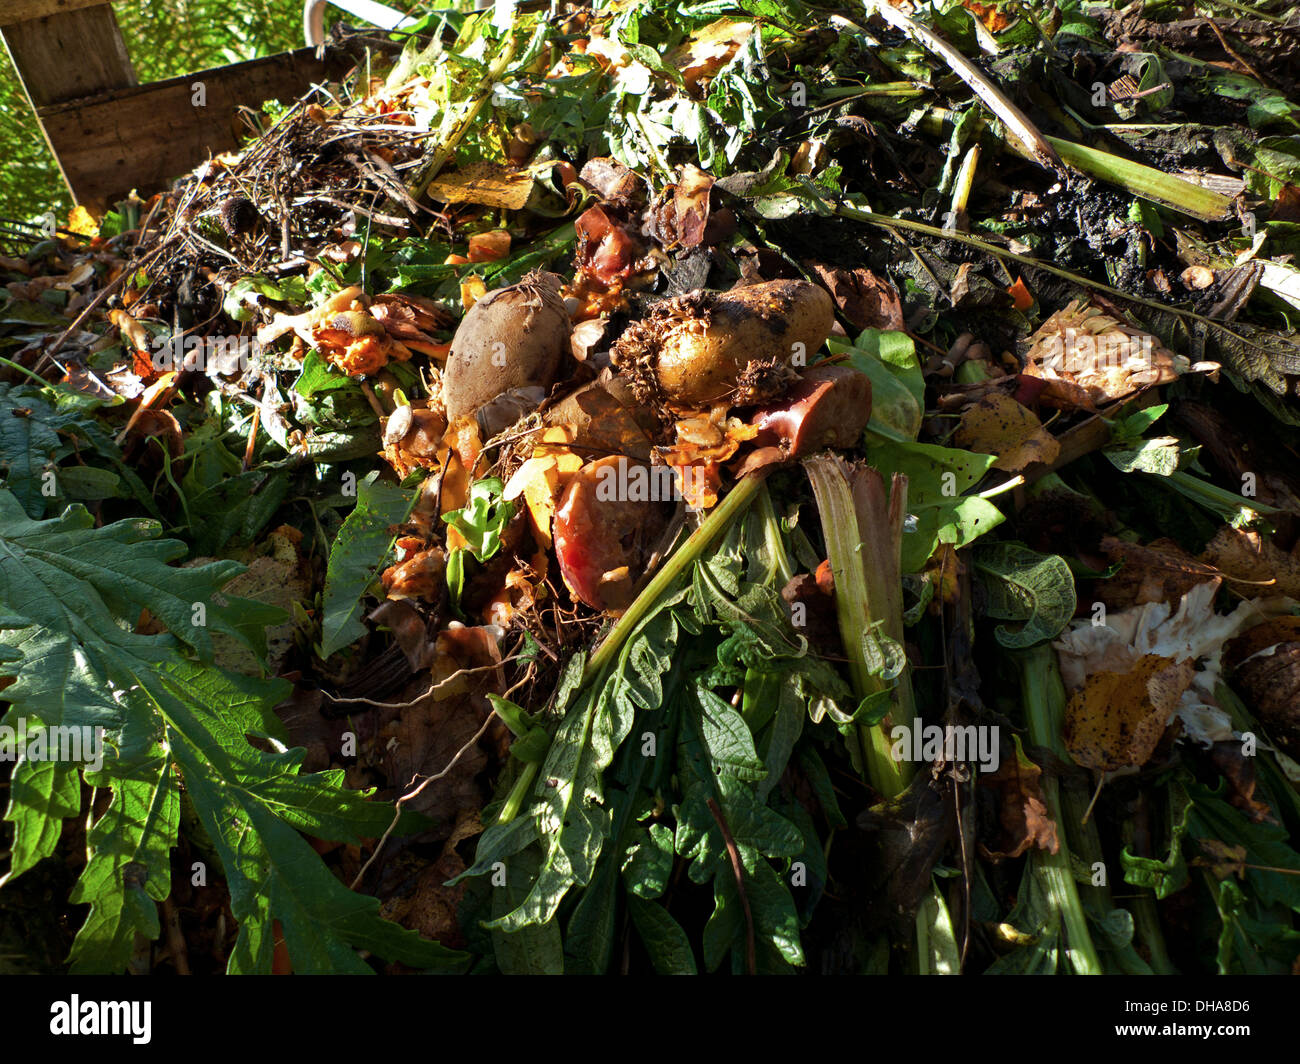 vegetable organic kitchen waste in a composting bin in the garden in autumn dyfed wales uk kathy dewitt